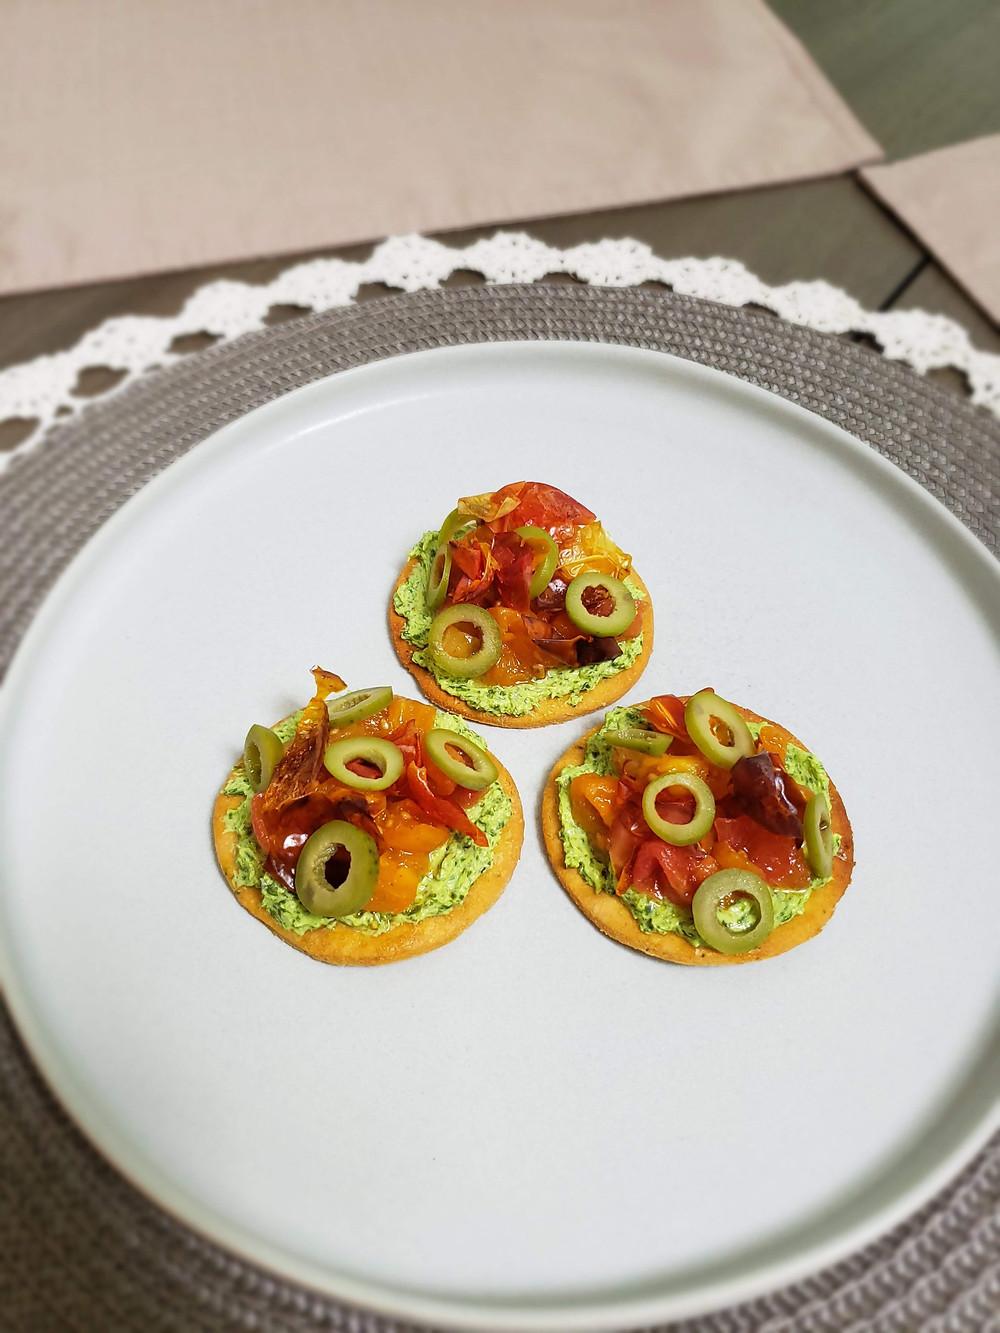 Basil Mascarpone | Smoked Chipotle Confit Tomatoes | Cherry Tomato Skin Crunchies | Castelvetrano Olives